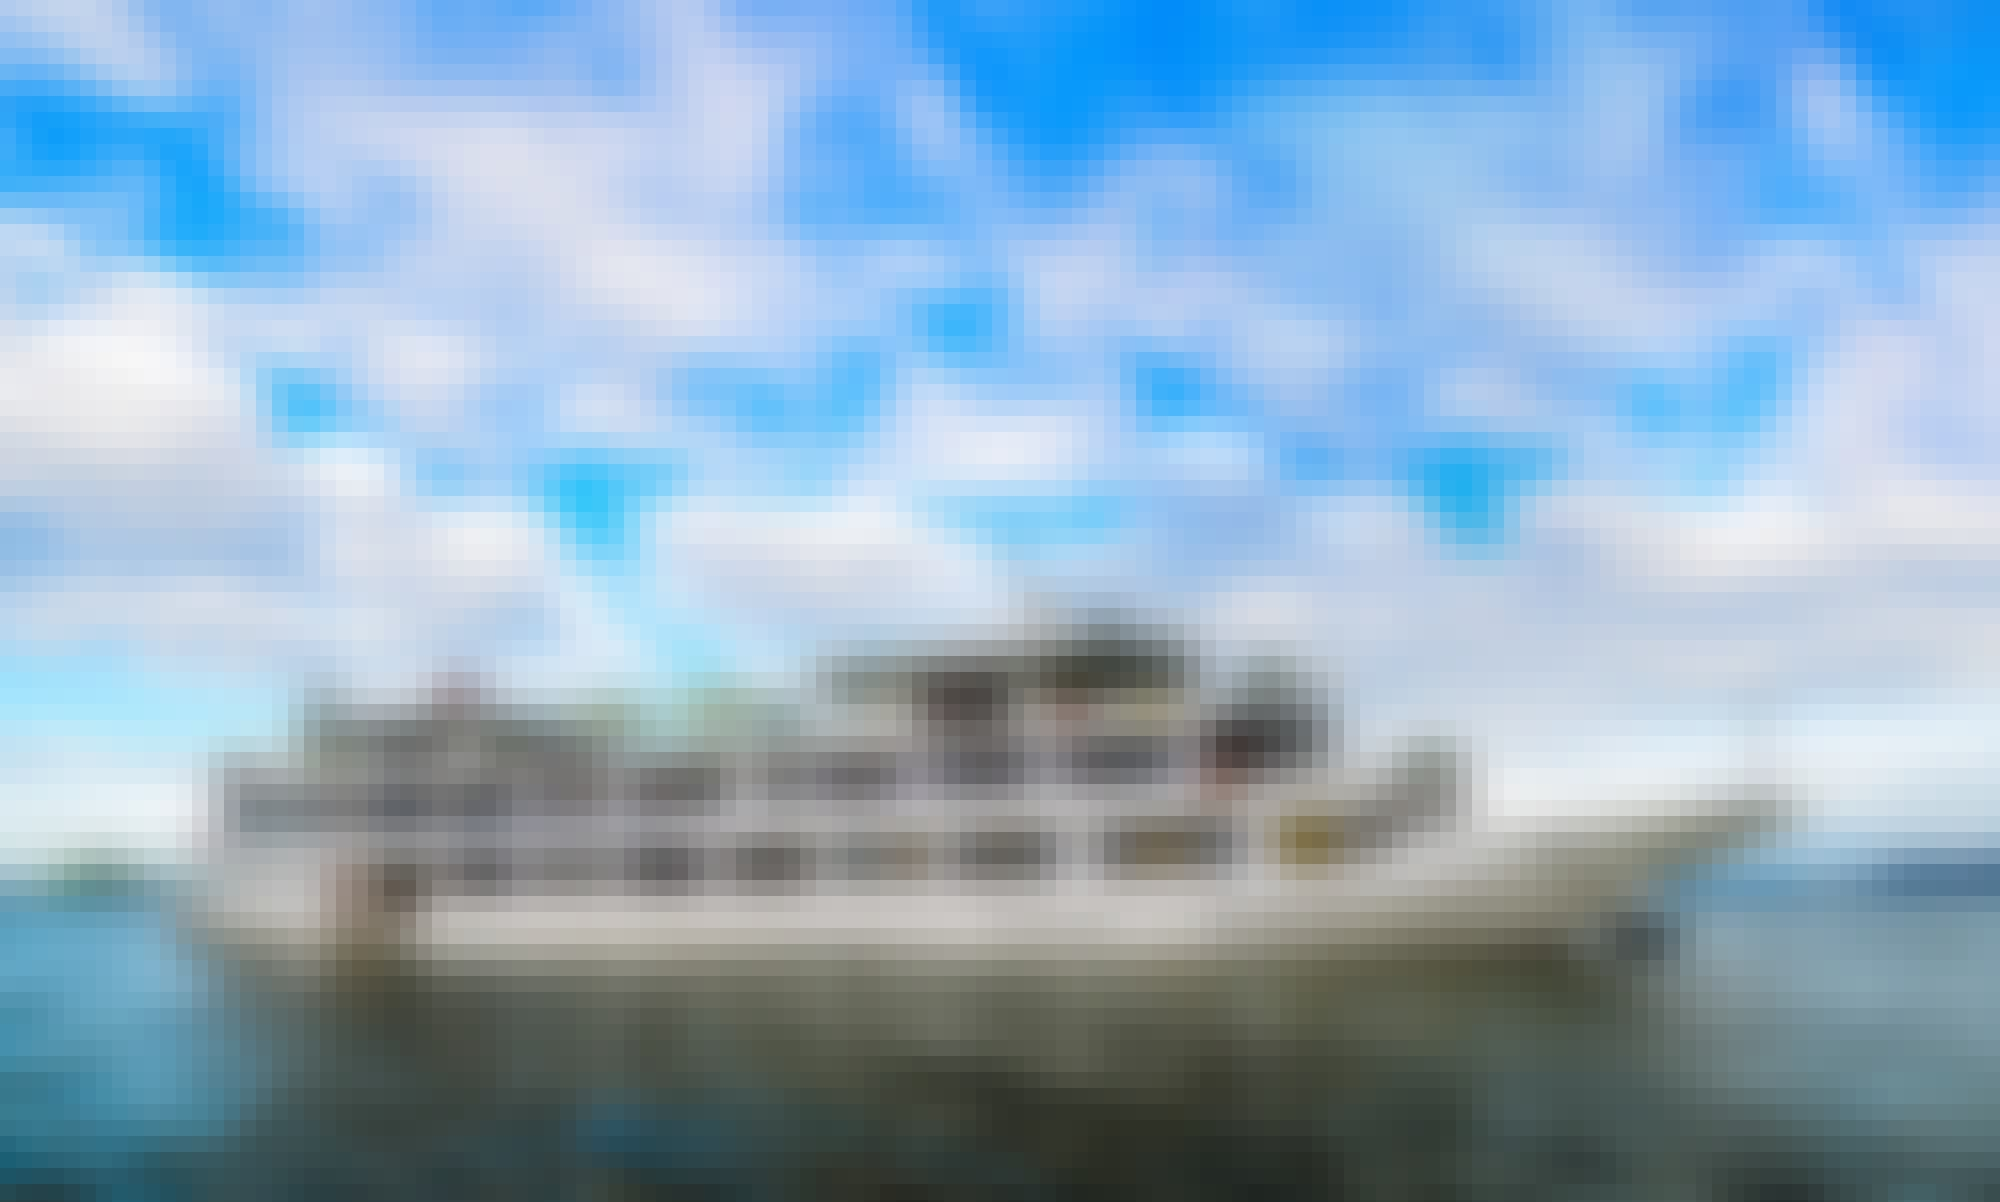 Silver Sea Crusie in tp. Hạ Long